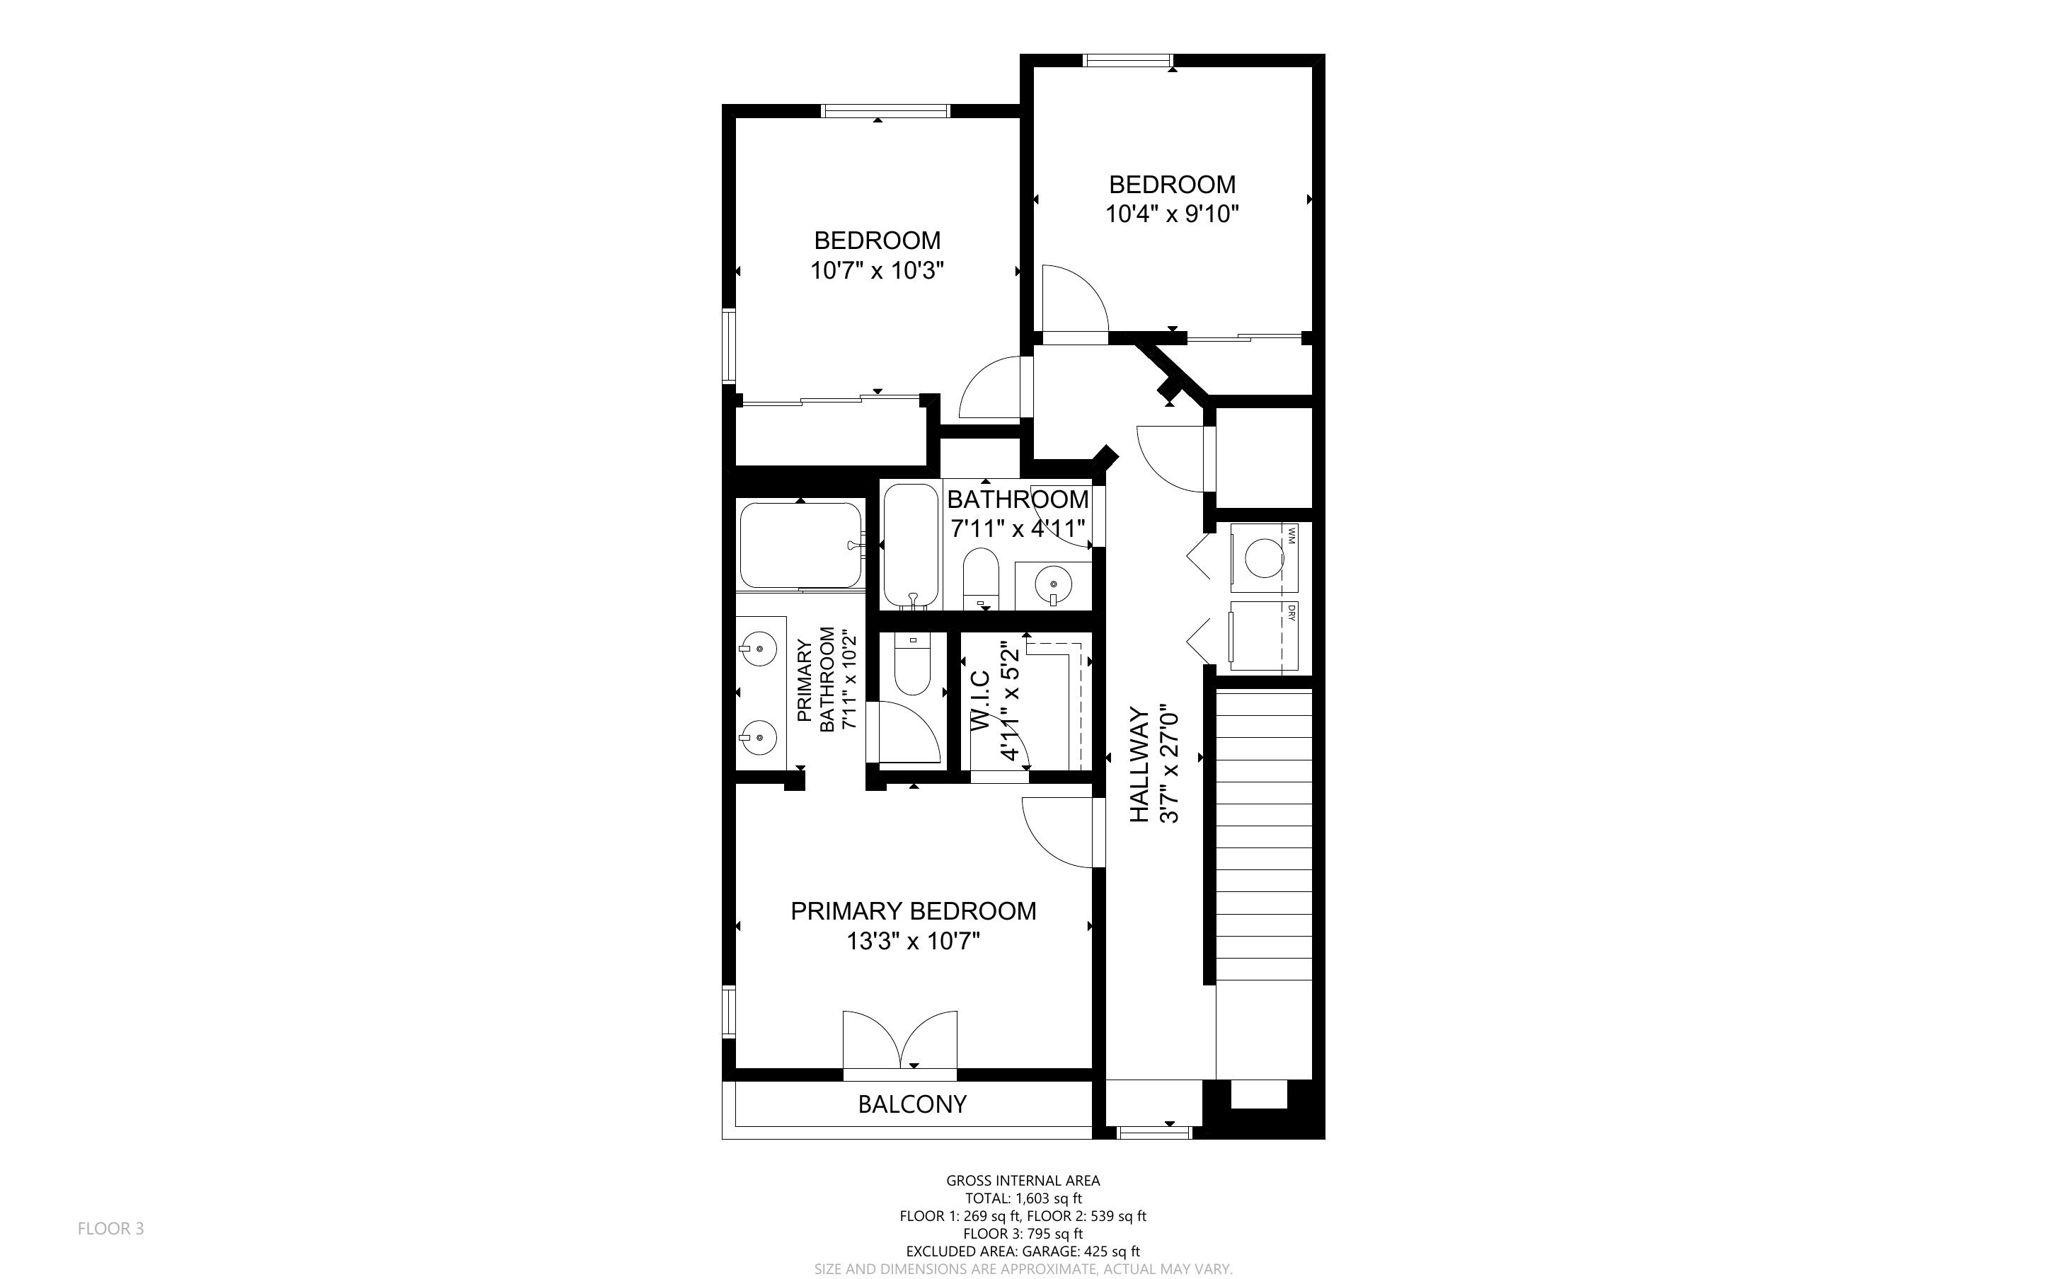 Floorplan #10